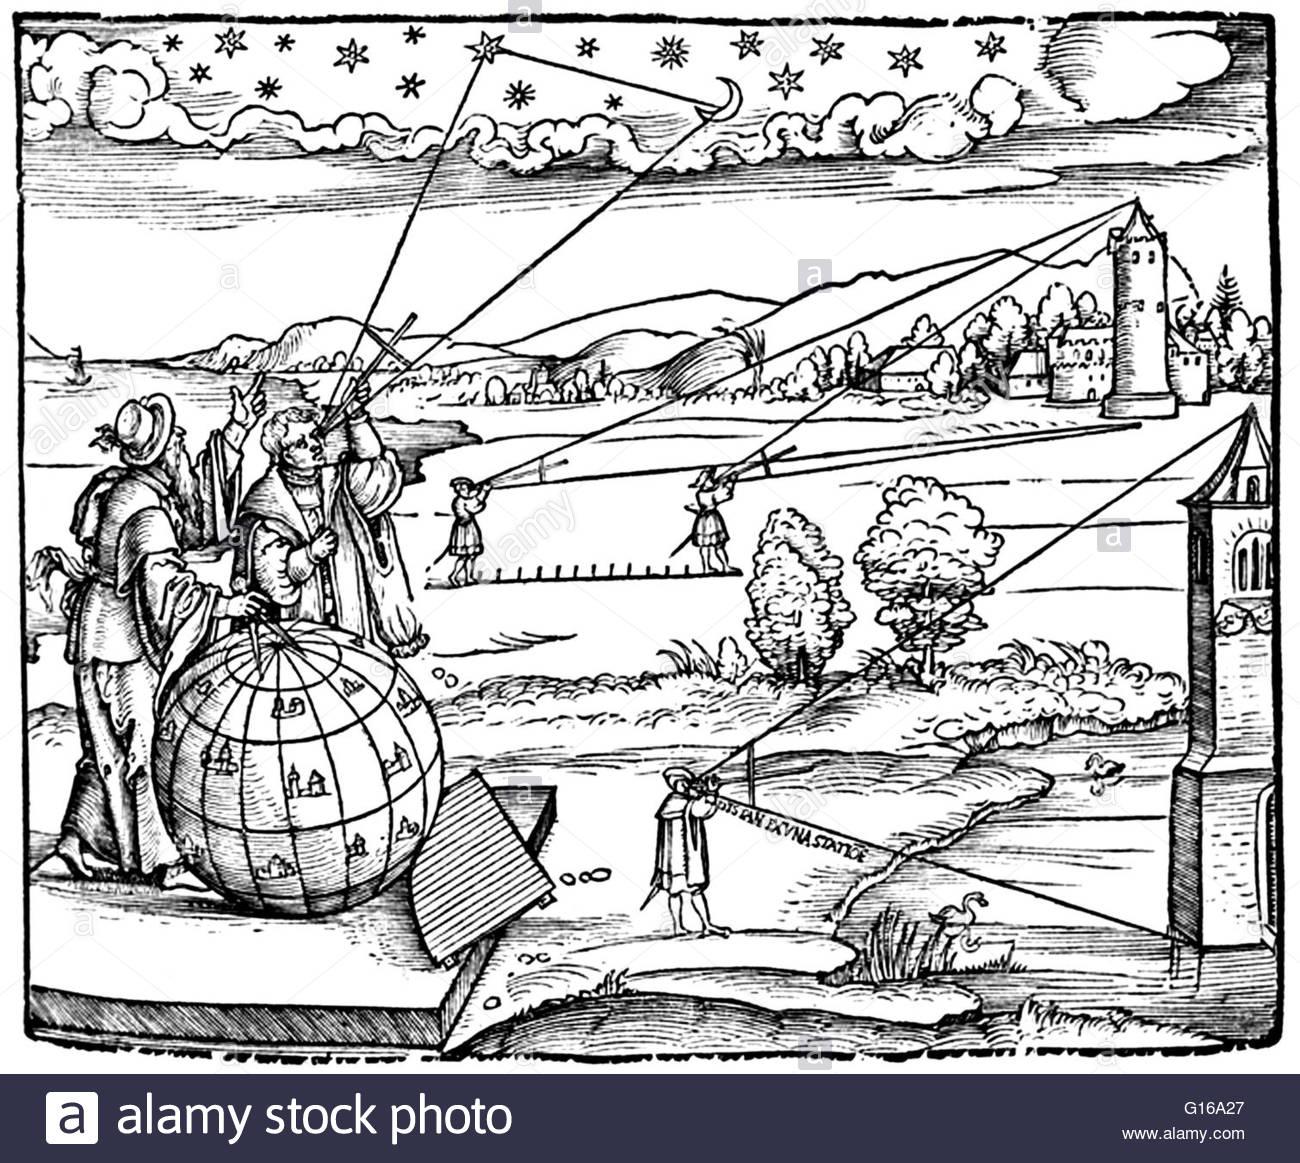 Frontispiece, Petrus Apianus, Introductio Geographica, 1532 Stock.